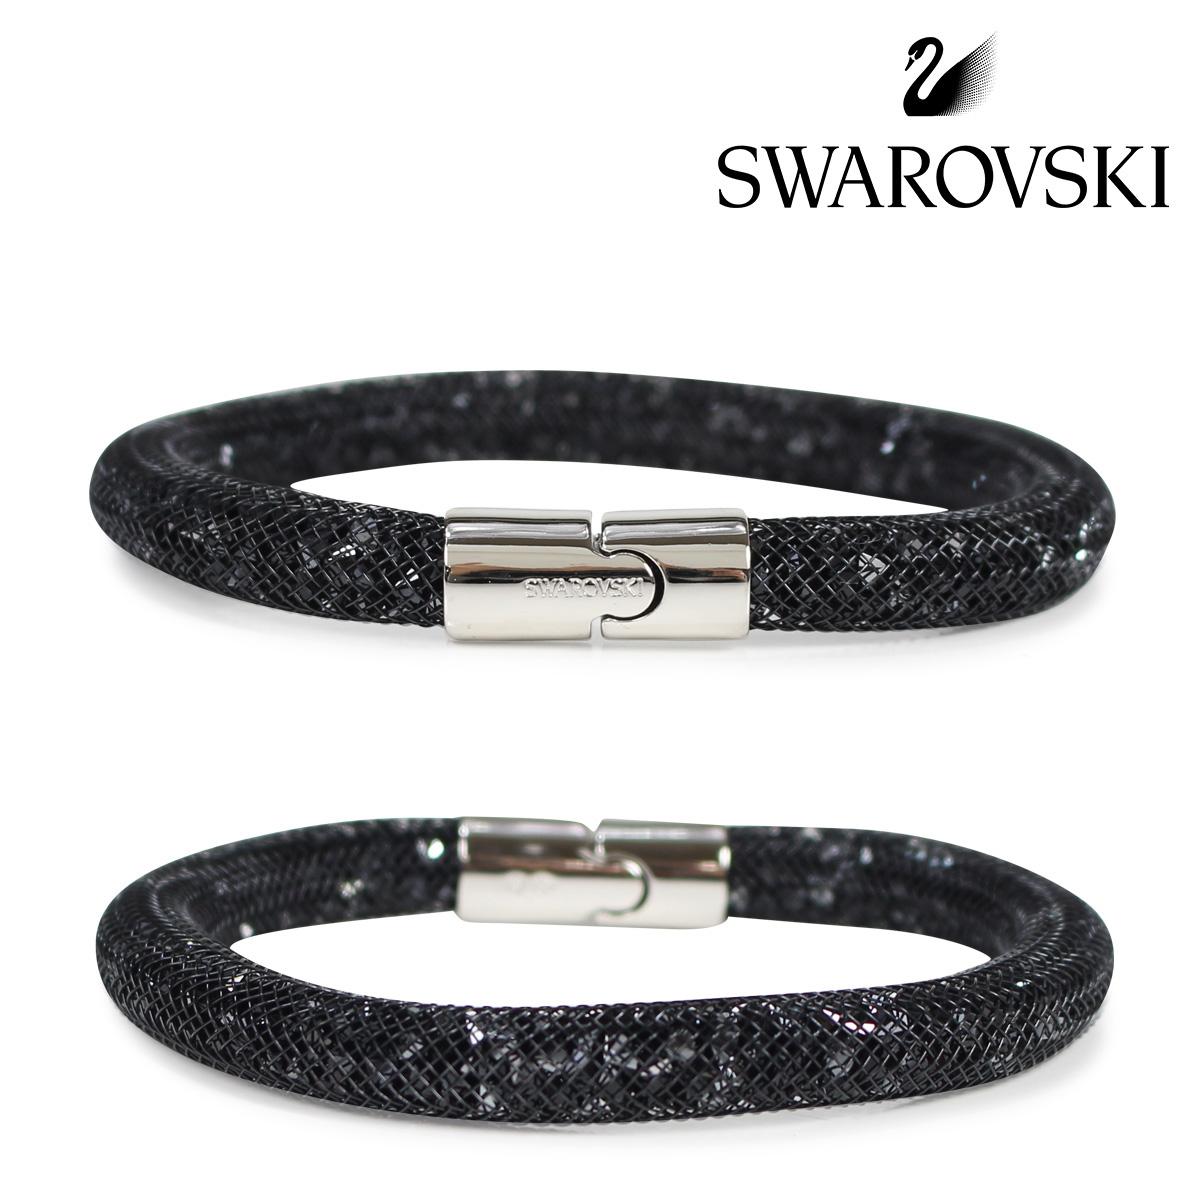 b938d91a422f0 SWAROVSKI STARDUST Swarovski bracelet Lady's black 5102552 S [3/19 Shinnyu  load] [183]